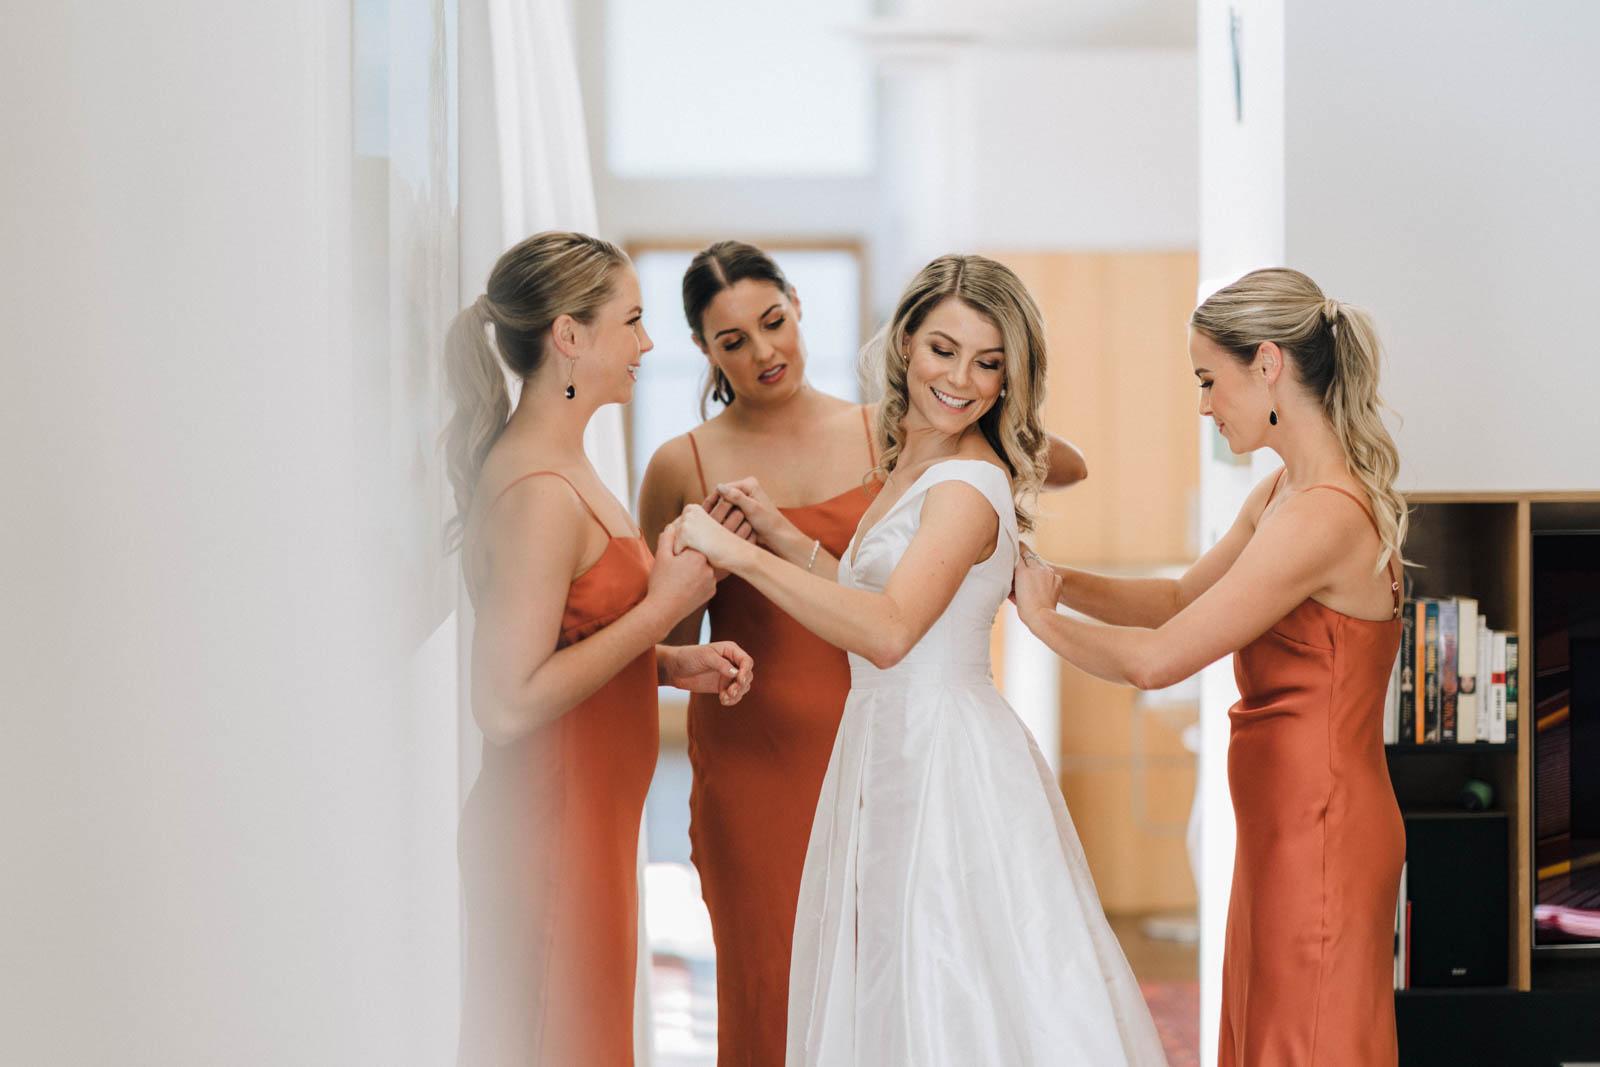 newfound-s-p-mt-maunganui-tauranga-wedding-photographer-1416-A9_04614